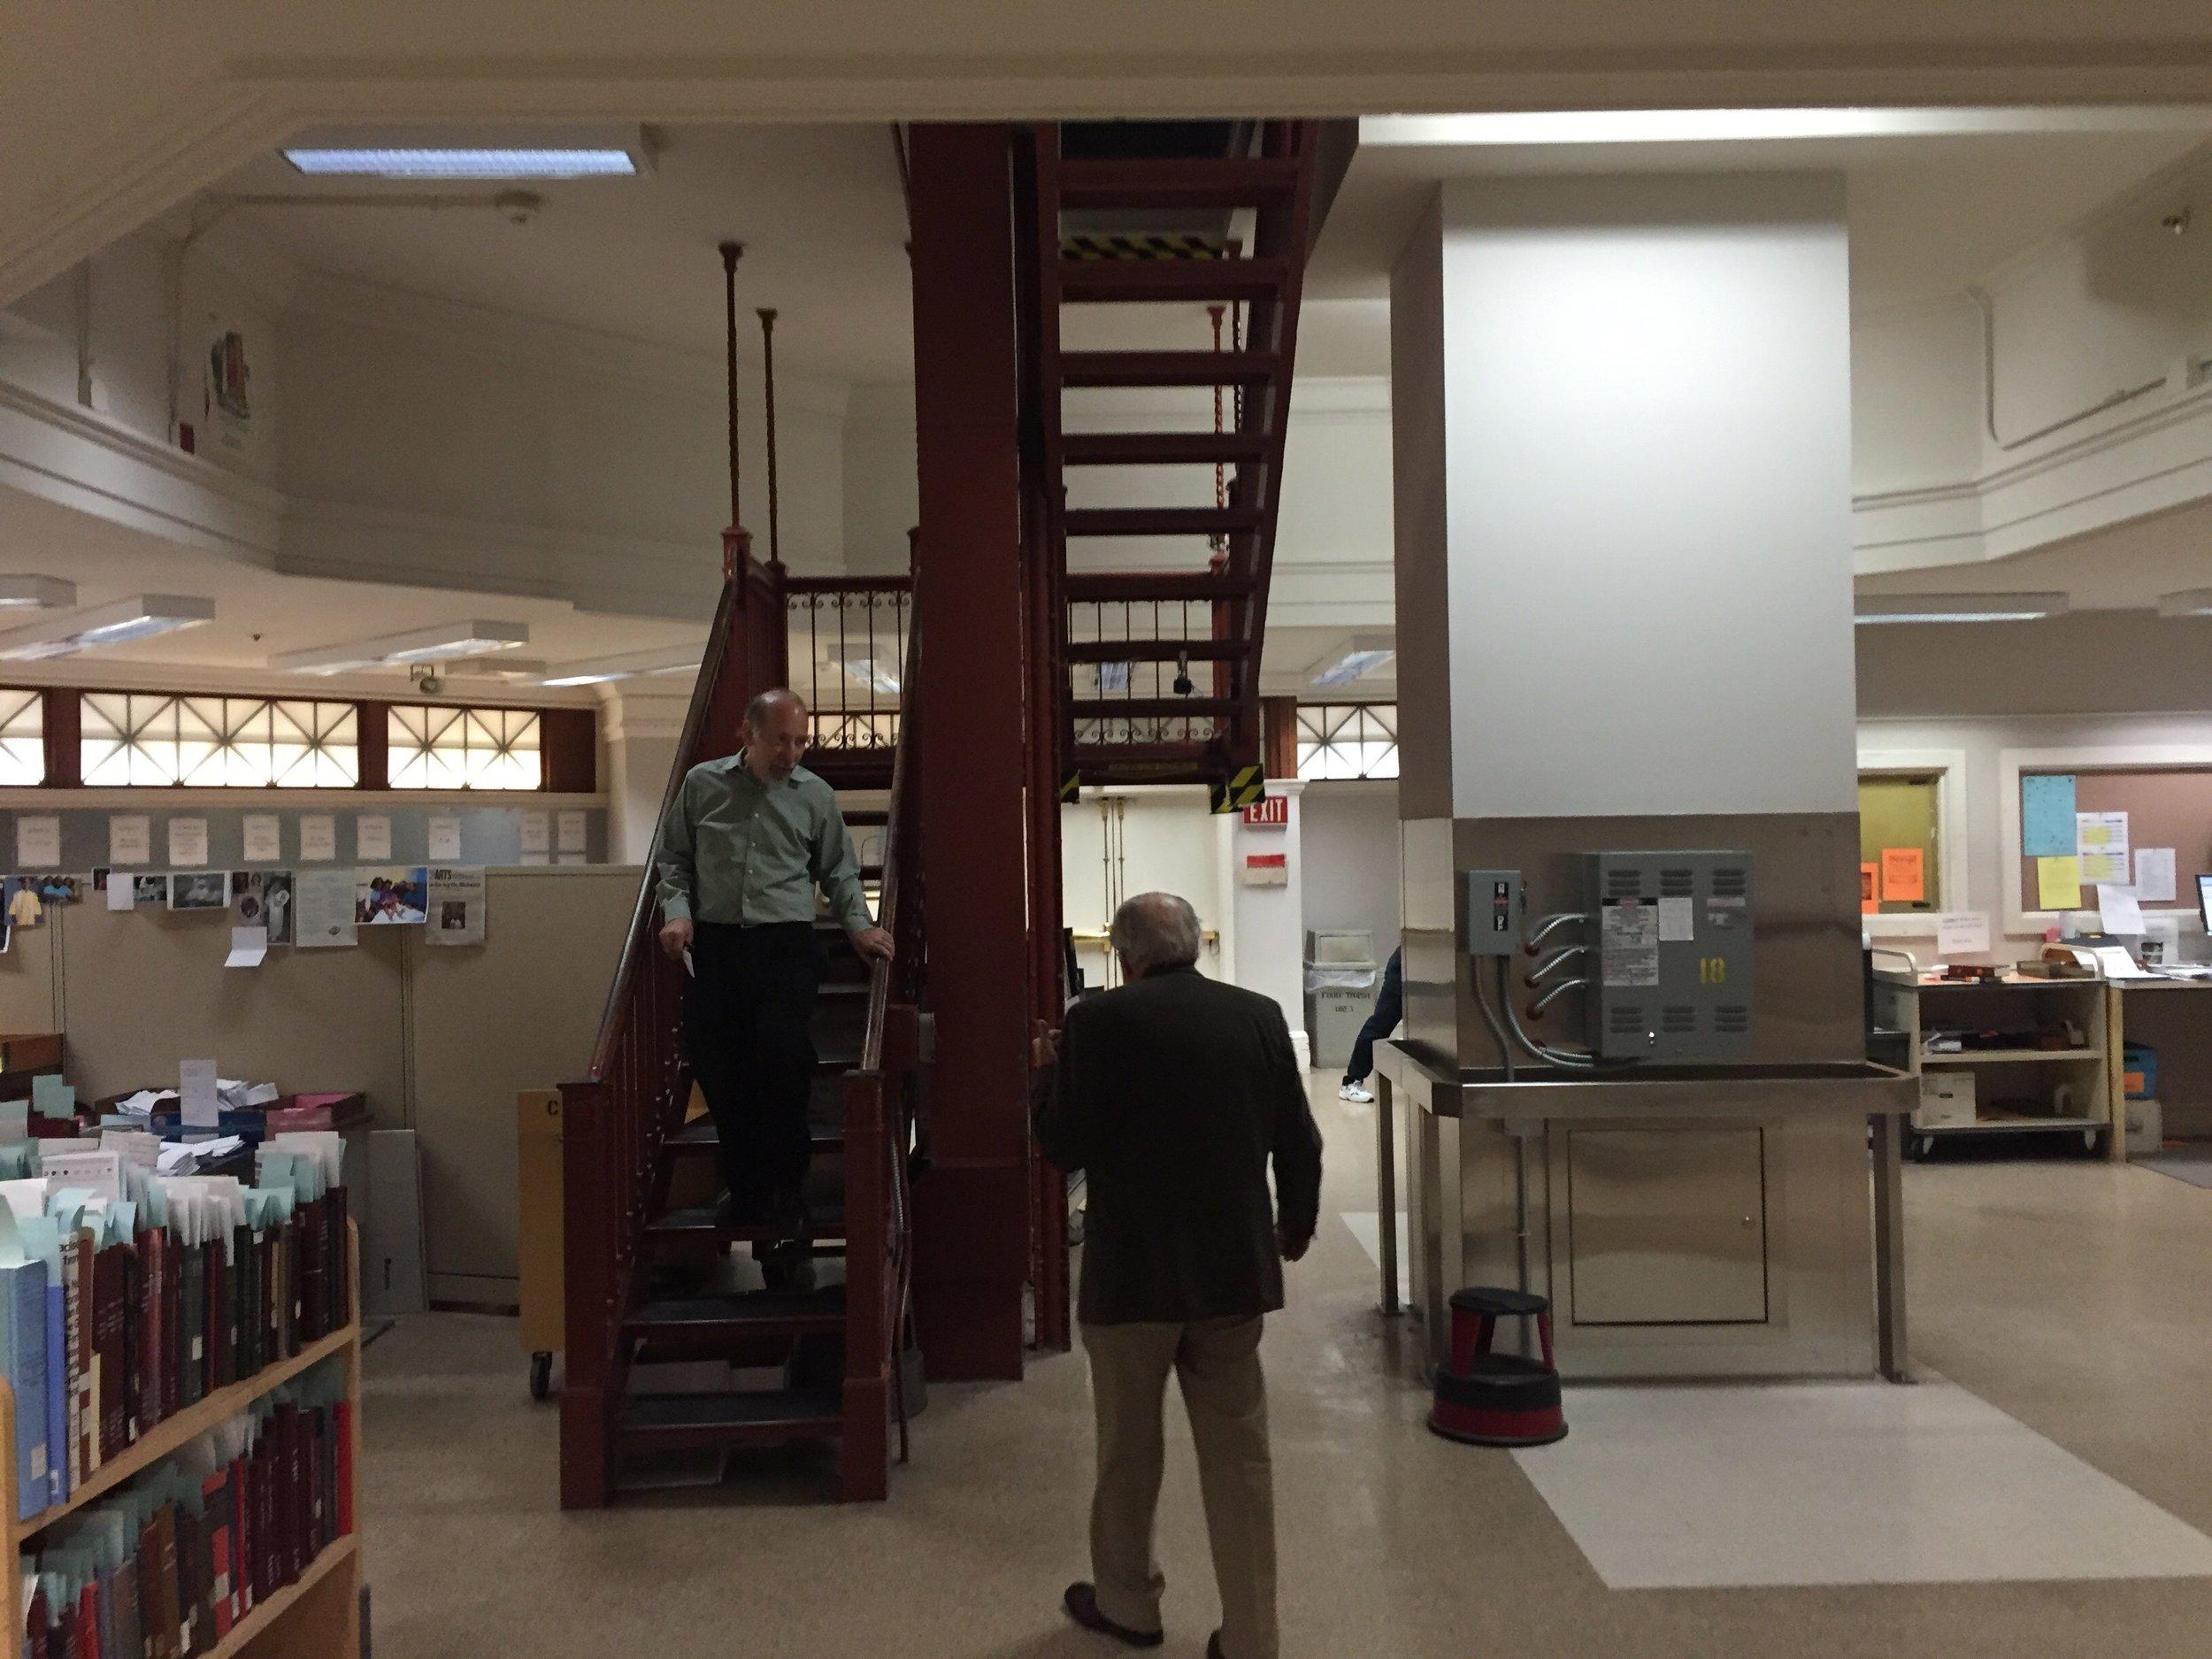 beneath-library-of-congress-main-reading-room